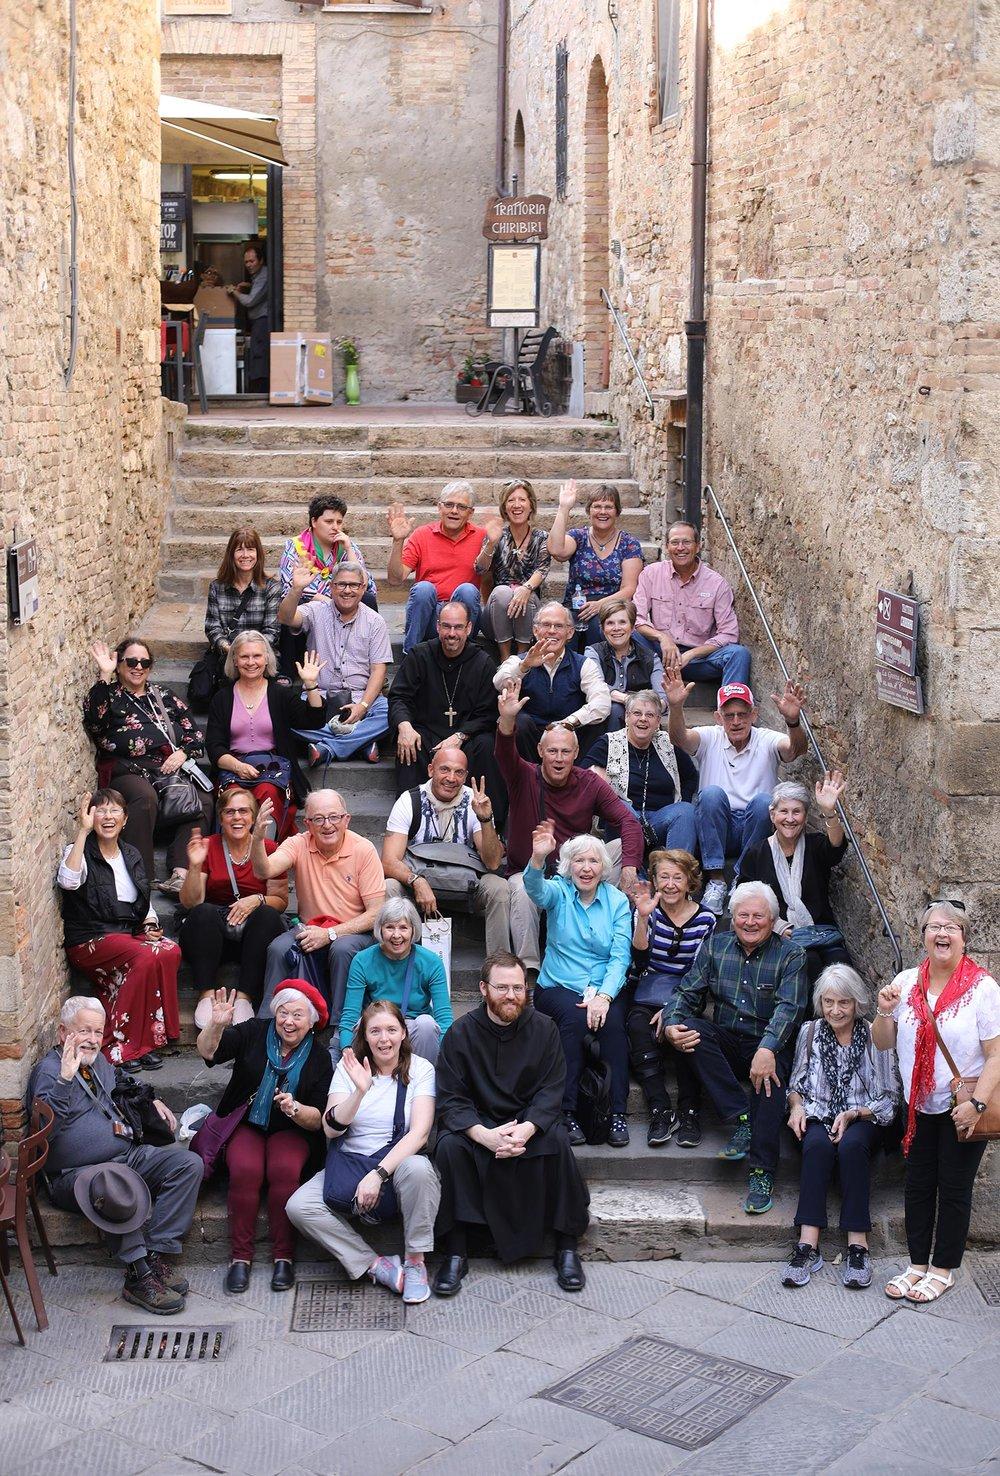 Pilgrimage_Rome_4249_SG.jpg